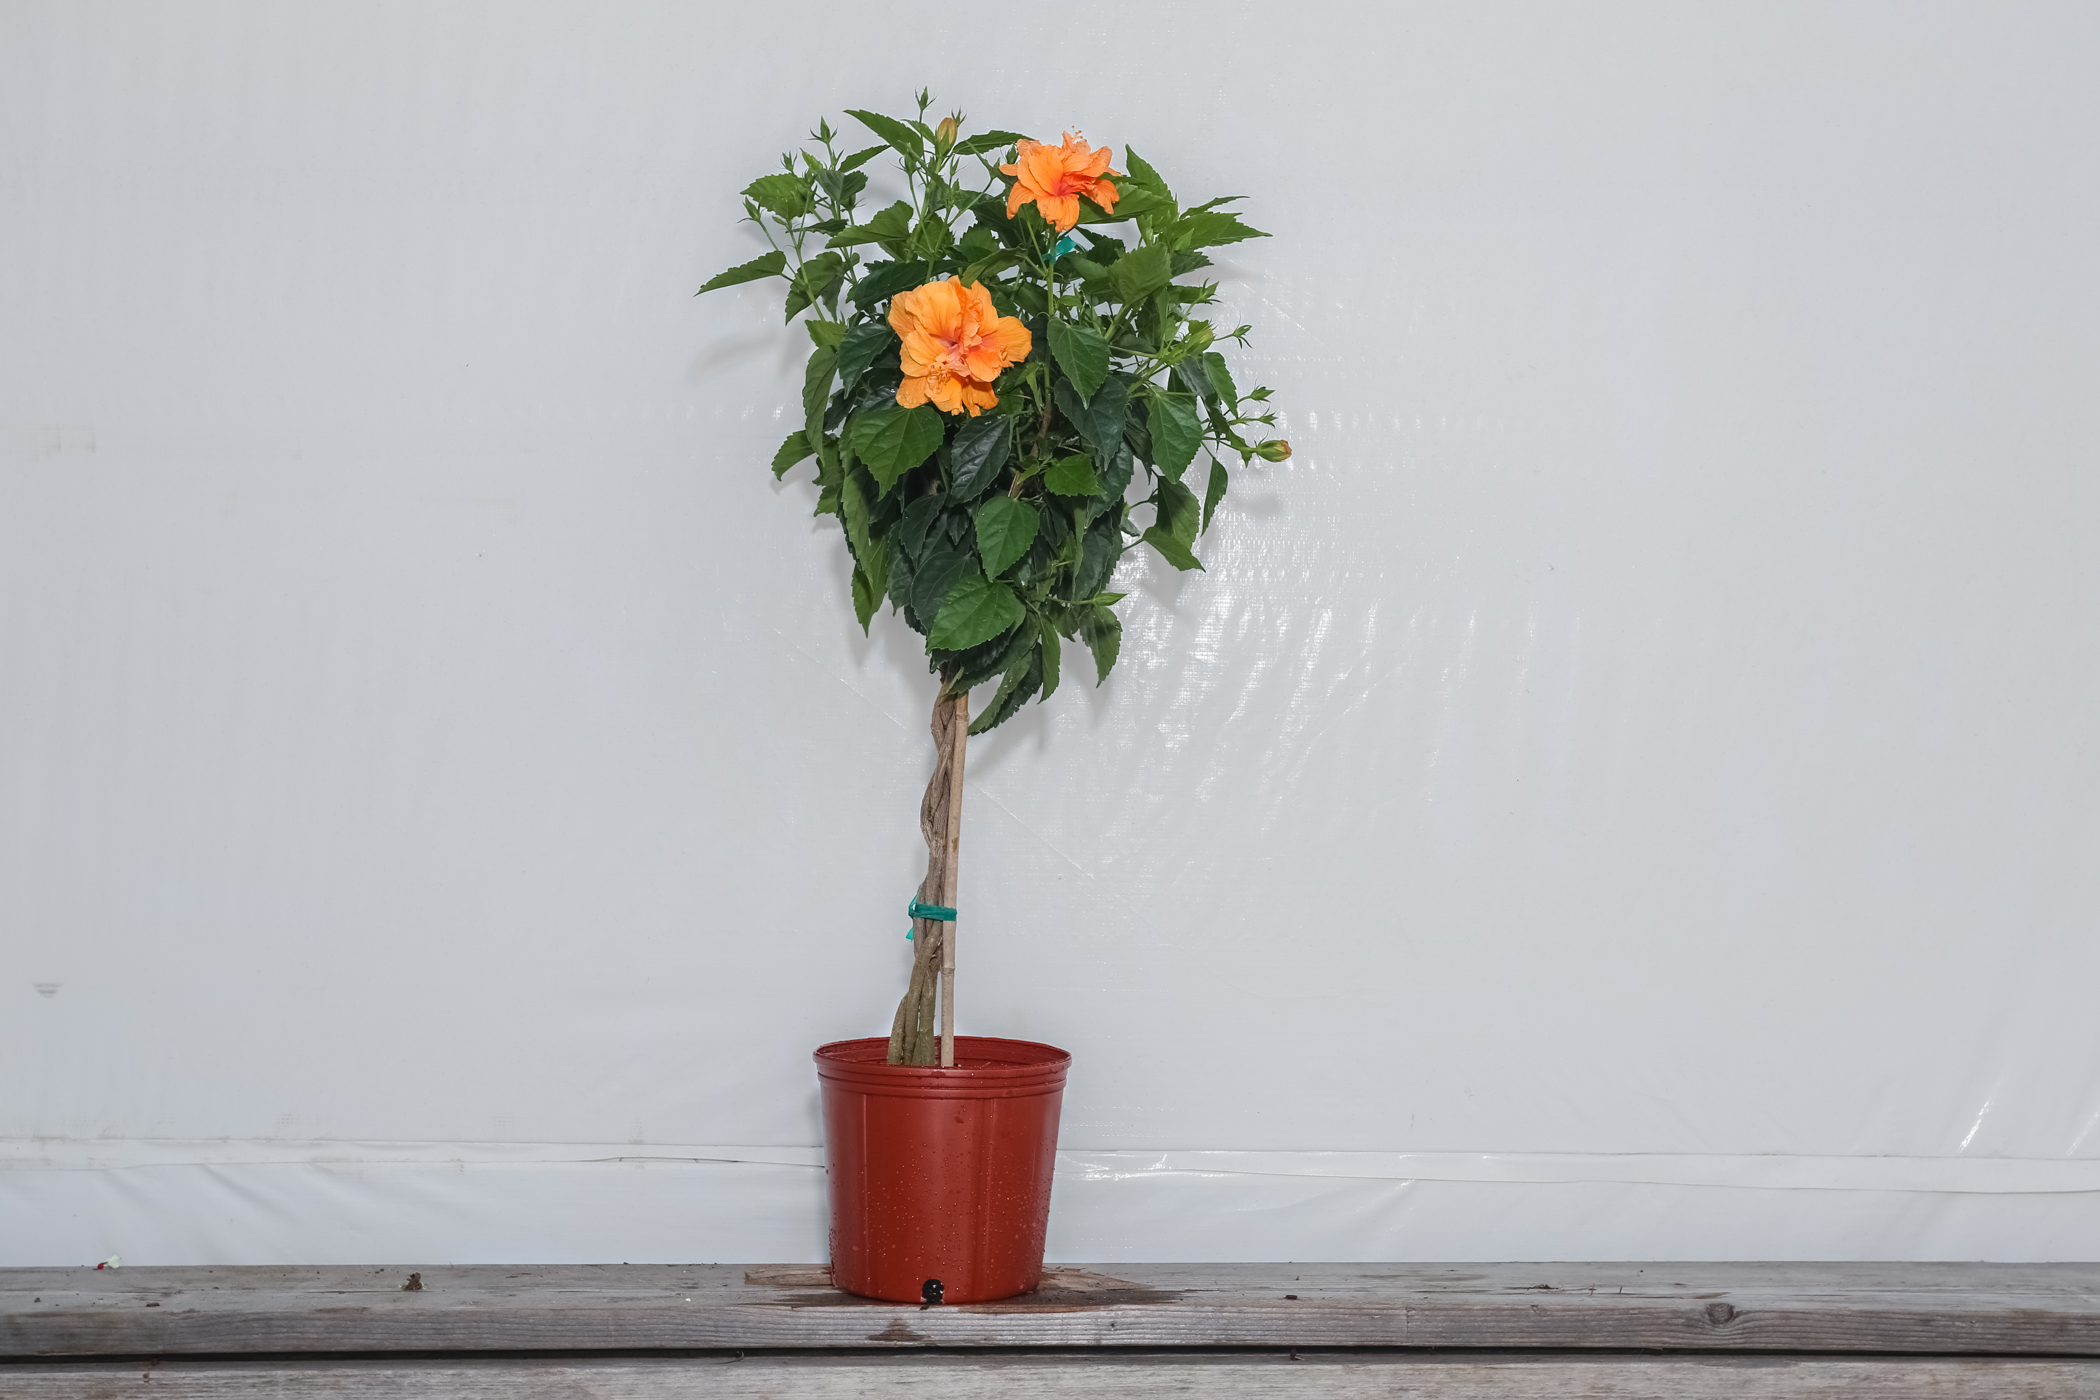 Hibiscus Standard Double Peach Tree 7 Gallon